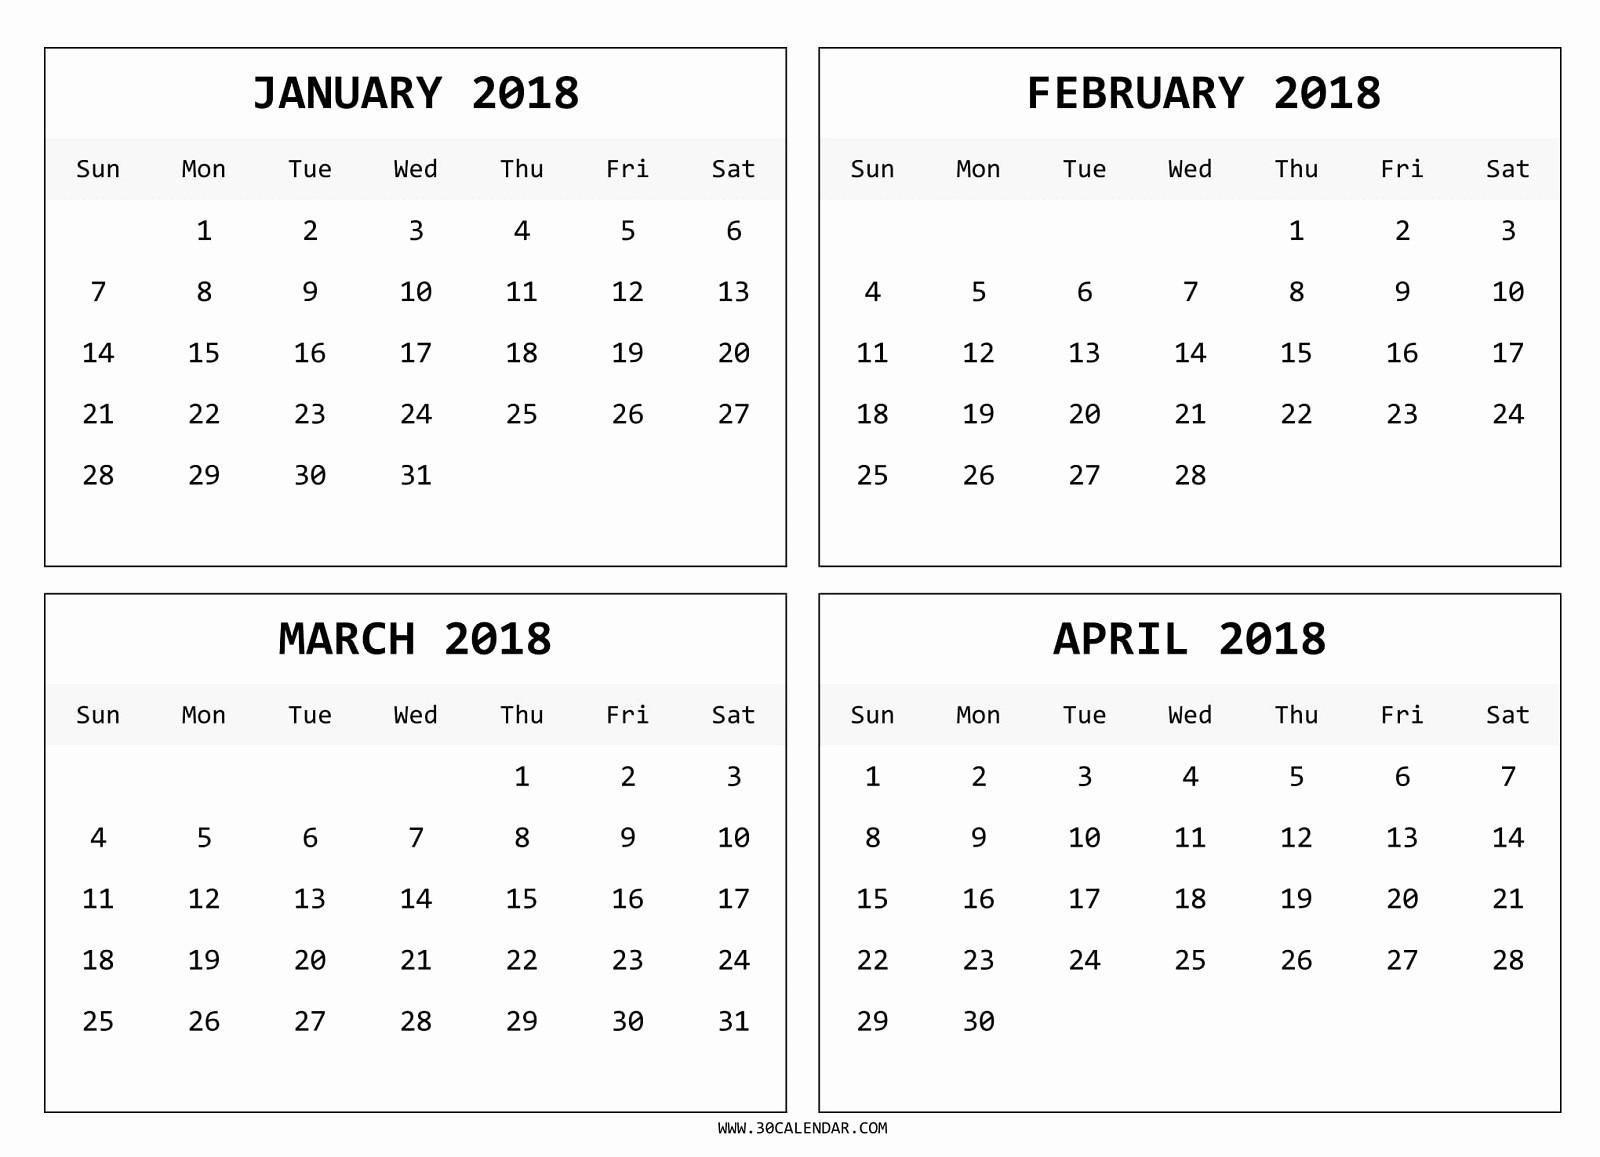 2018 Four Month Calendar Template Fresh Four Month January February March April 2018 Calendar